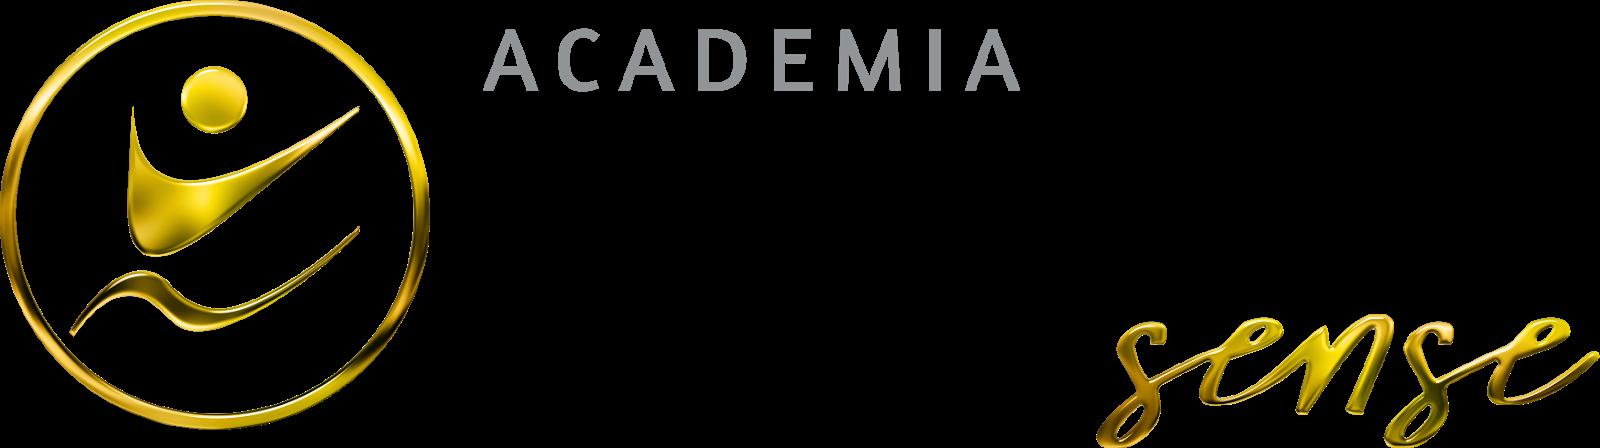 Academia Persona Sense